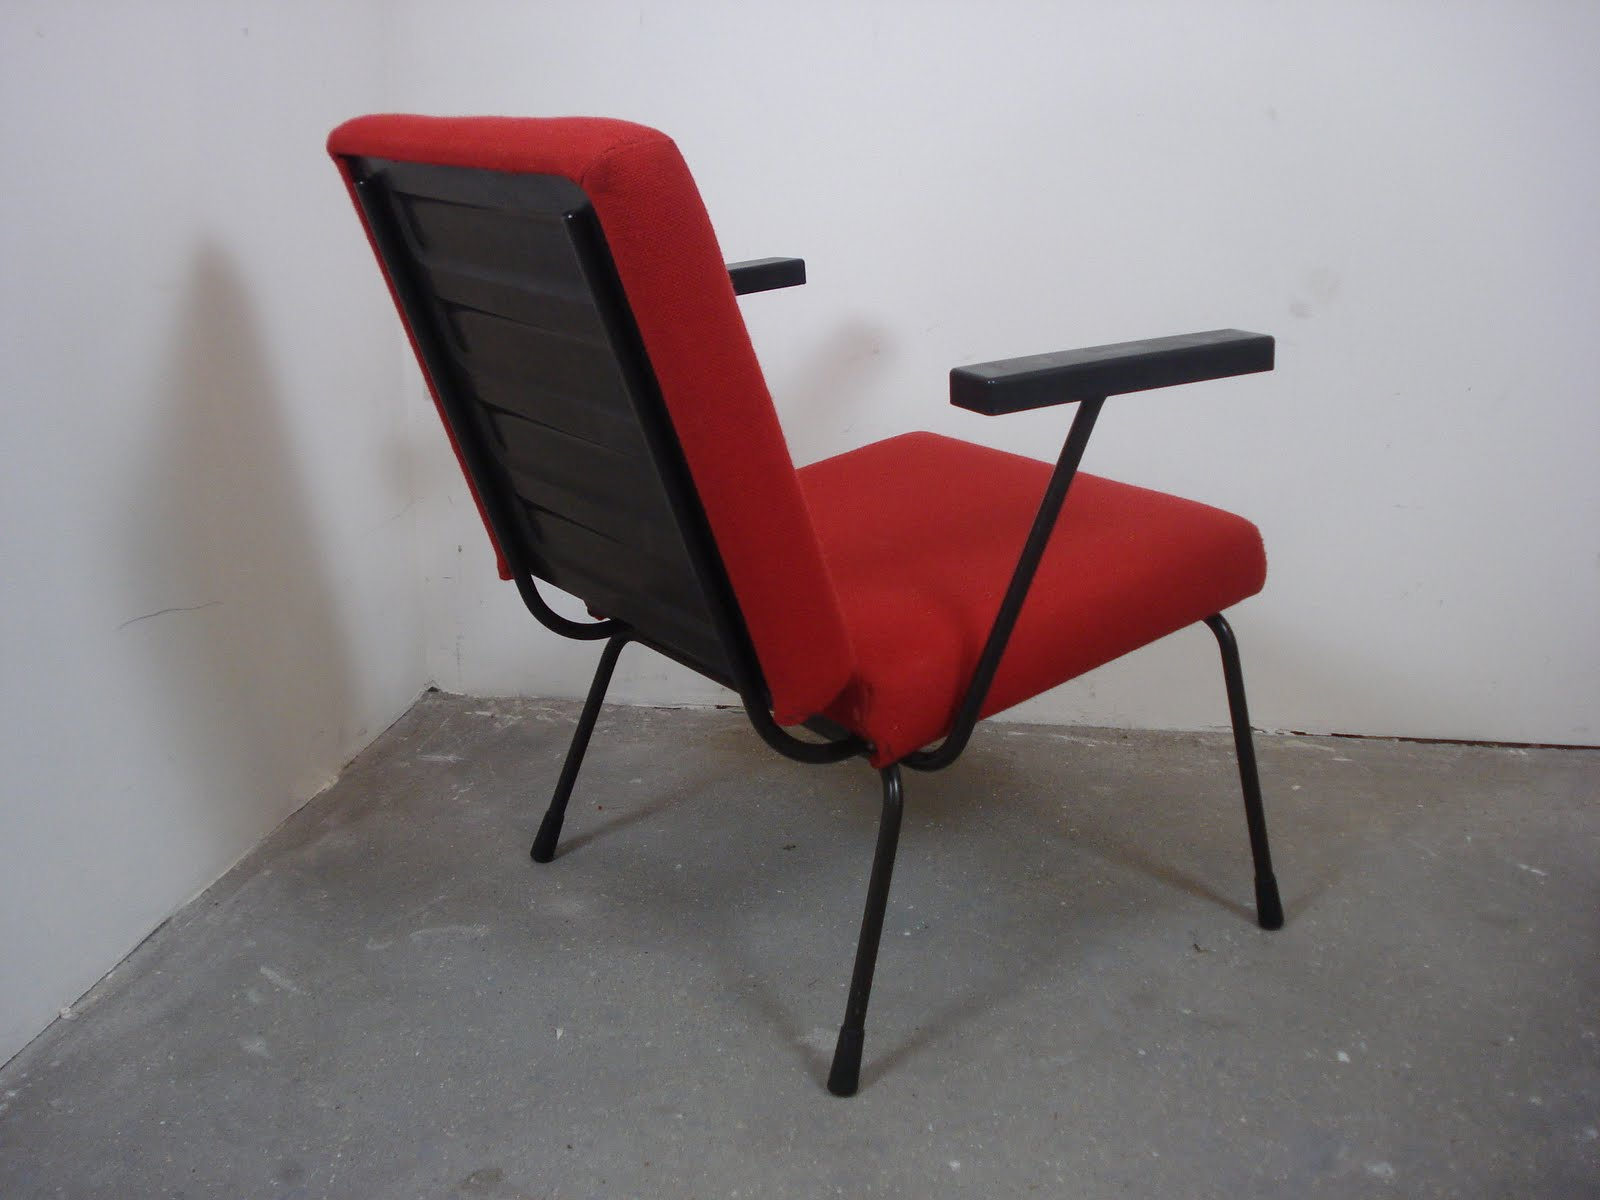 Gispen 1407 Fauteuils.Tolve Art Design Gispen 1407 Design Rietveld